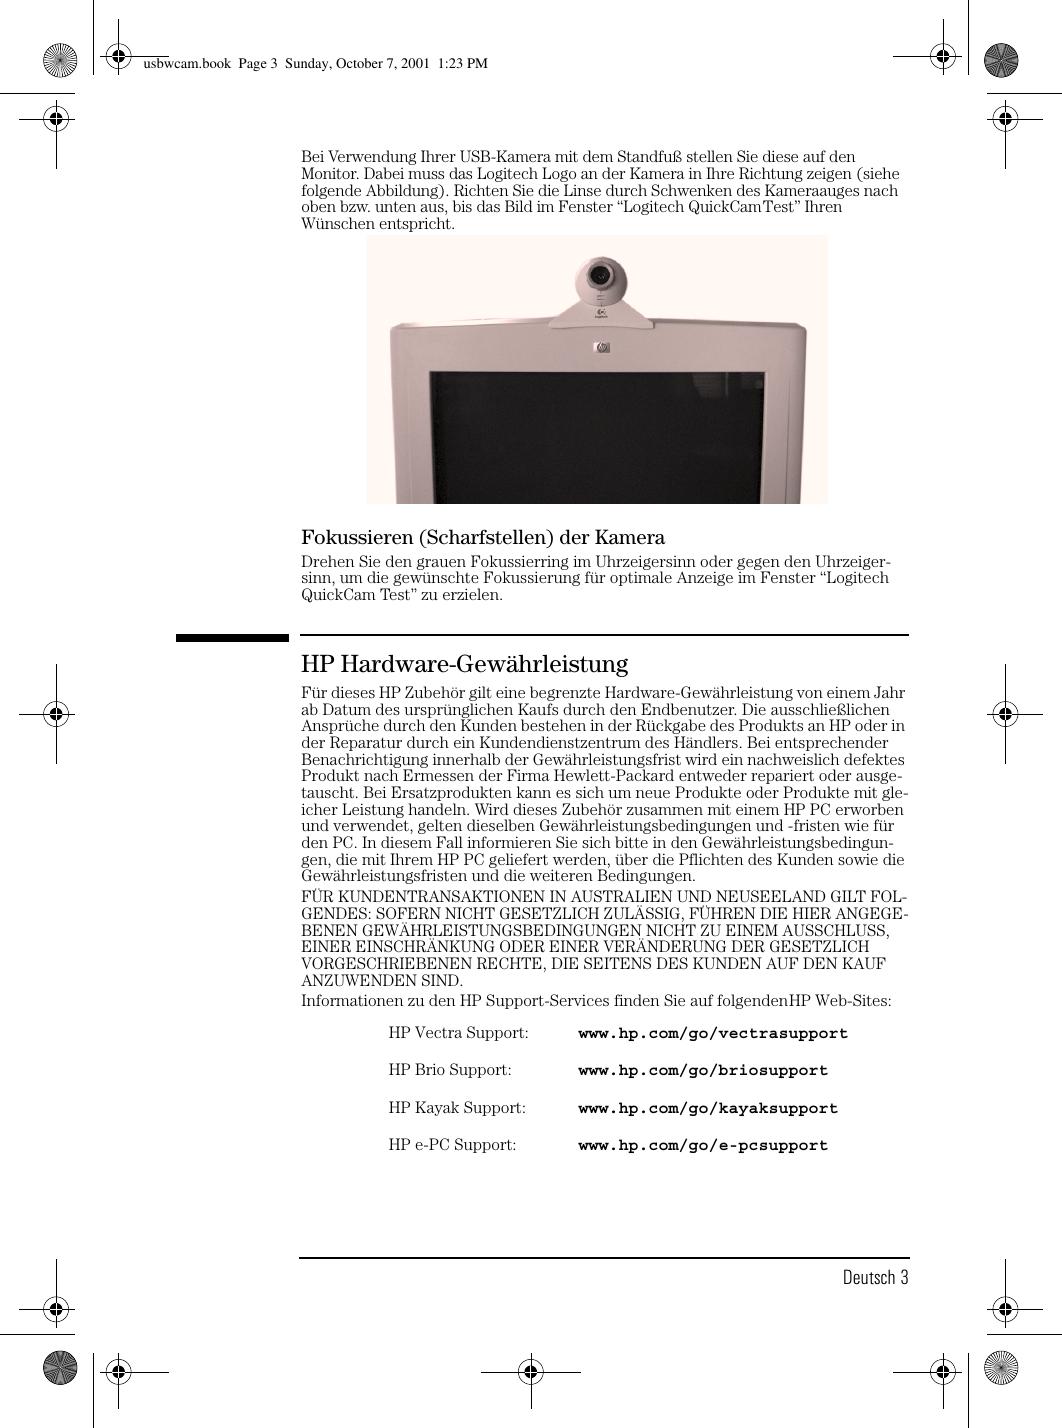 Hp Usbwcam Usb Pc Web Camera P1978a Installation Guide Lpv09346 Logitech Quickcam Wiring Diagram Page 7 Of 10